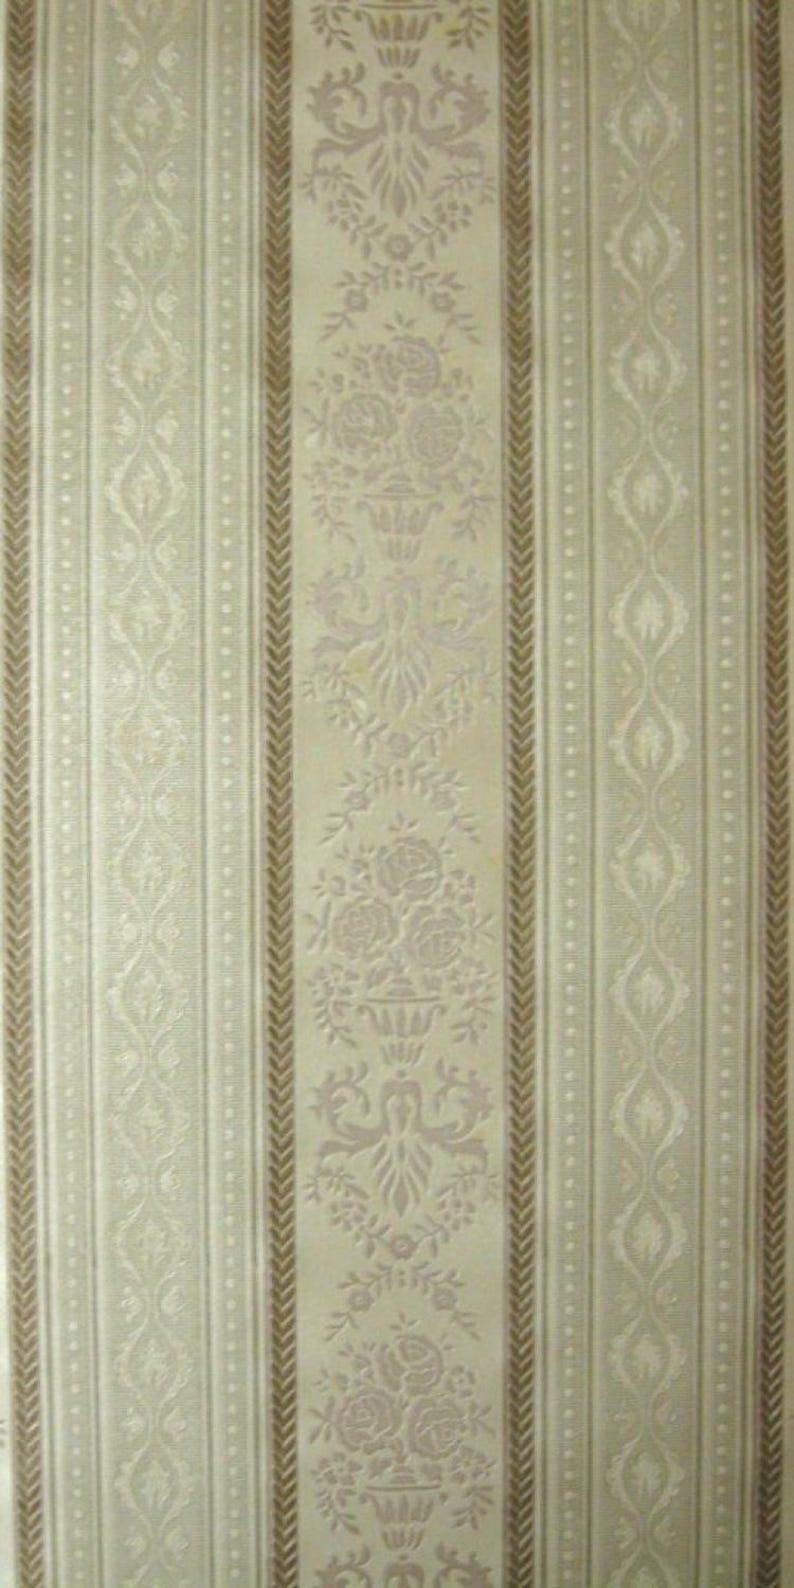 Vintage Wallpaper Sheffield per meter